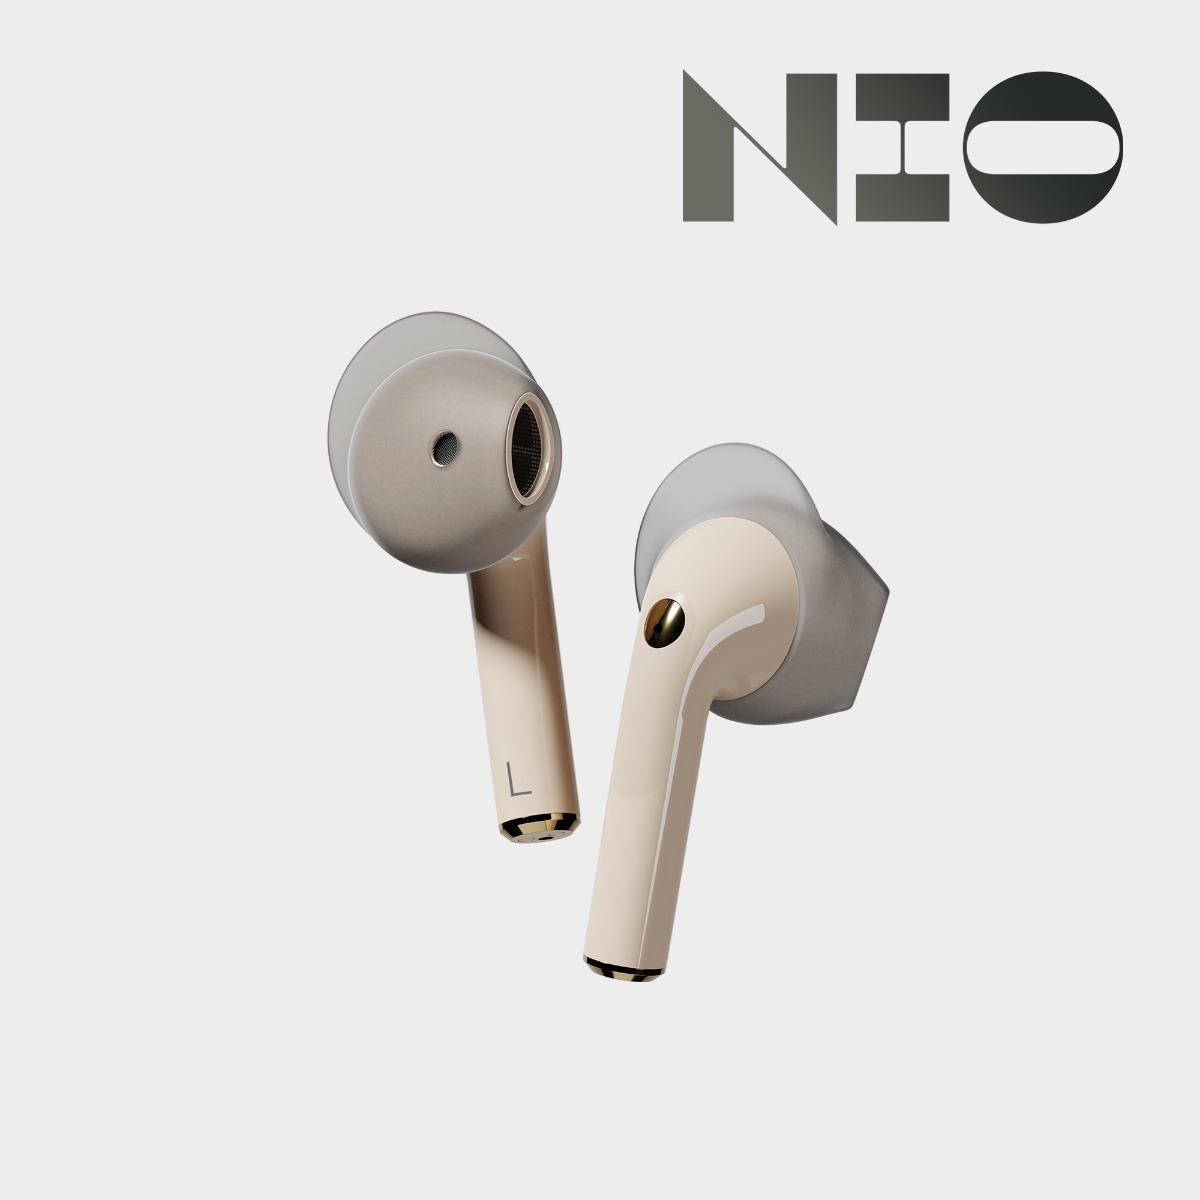 Sudio Nio earbuds earphones wireless IPX4 Adaptive dual-microphone technology wingtips